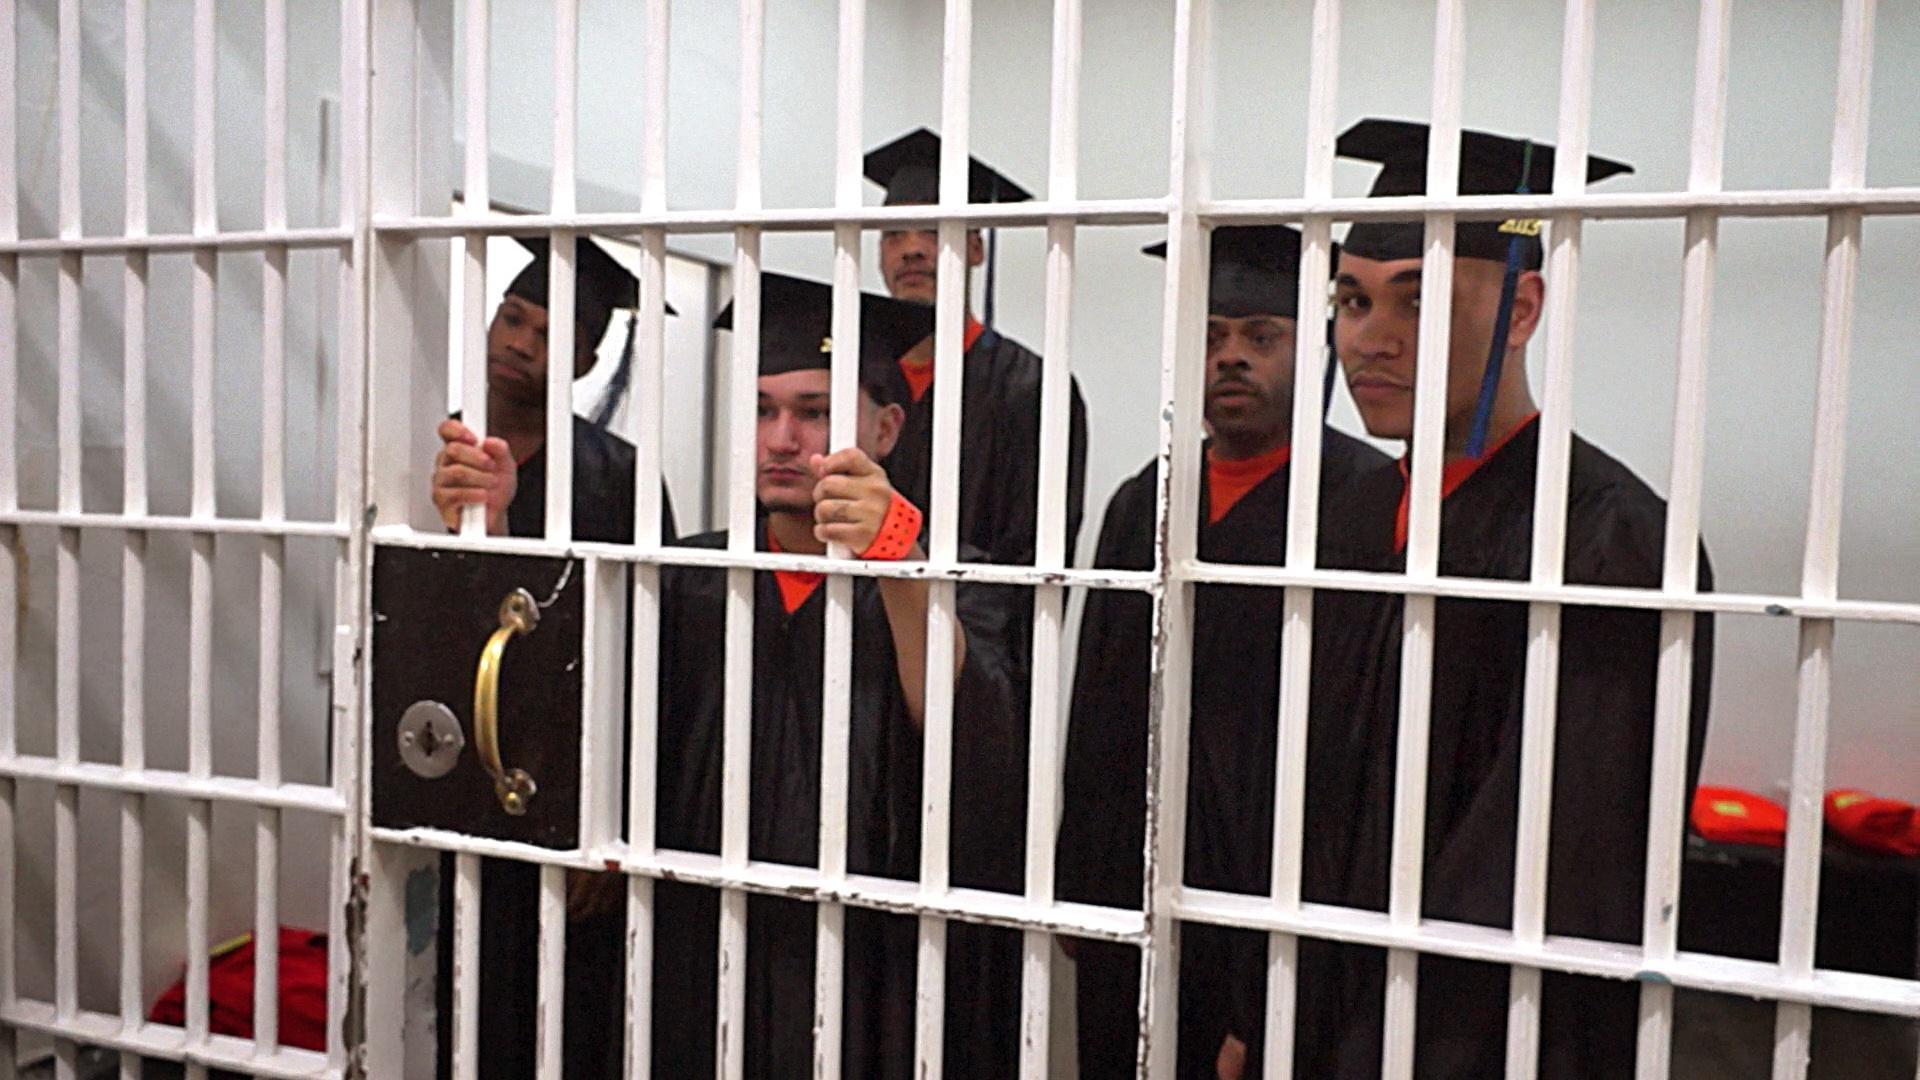 A High School Behind Bars